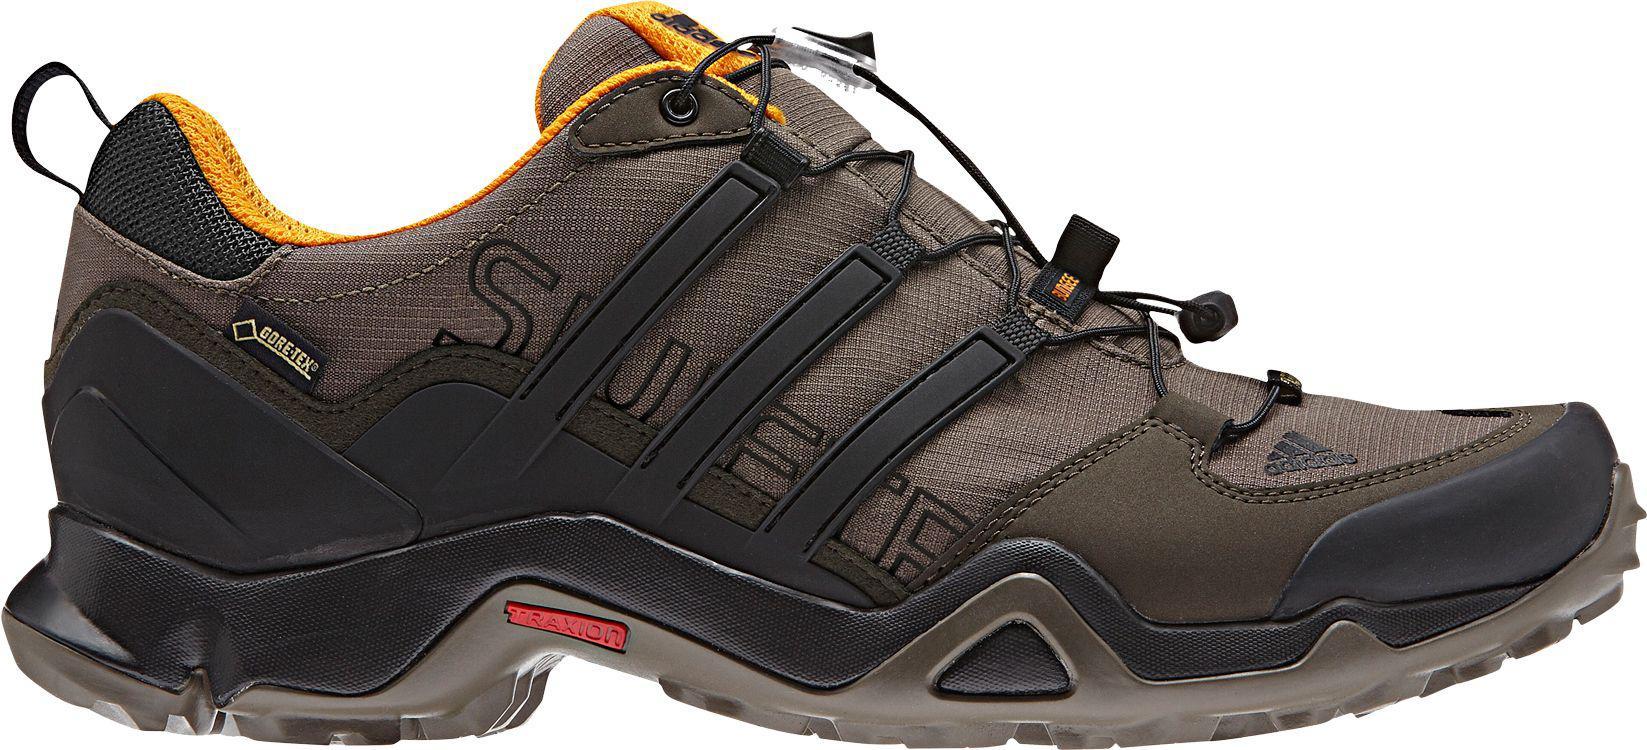 adidas Lace Terrex Swift R Gtx Hiking Shoes in Dark Green